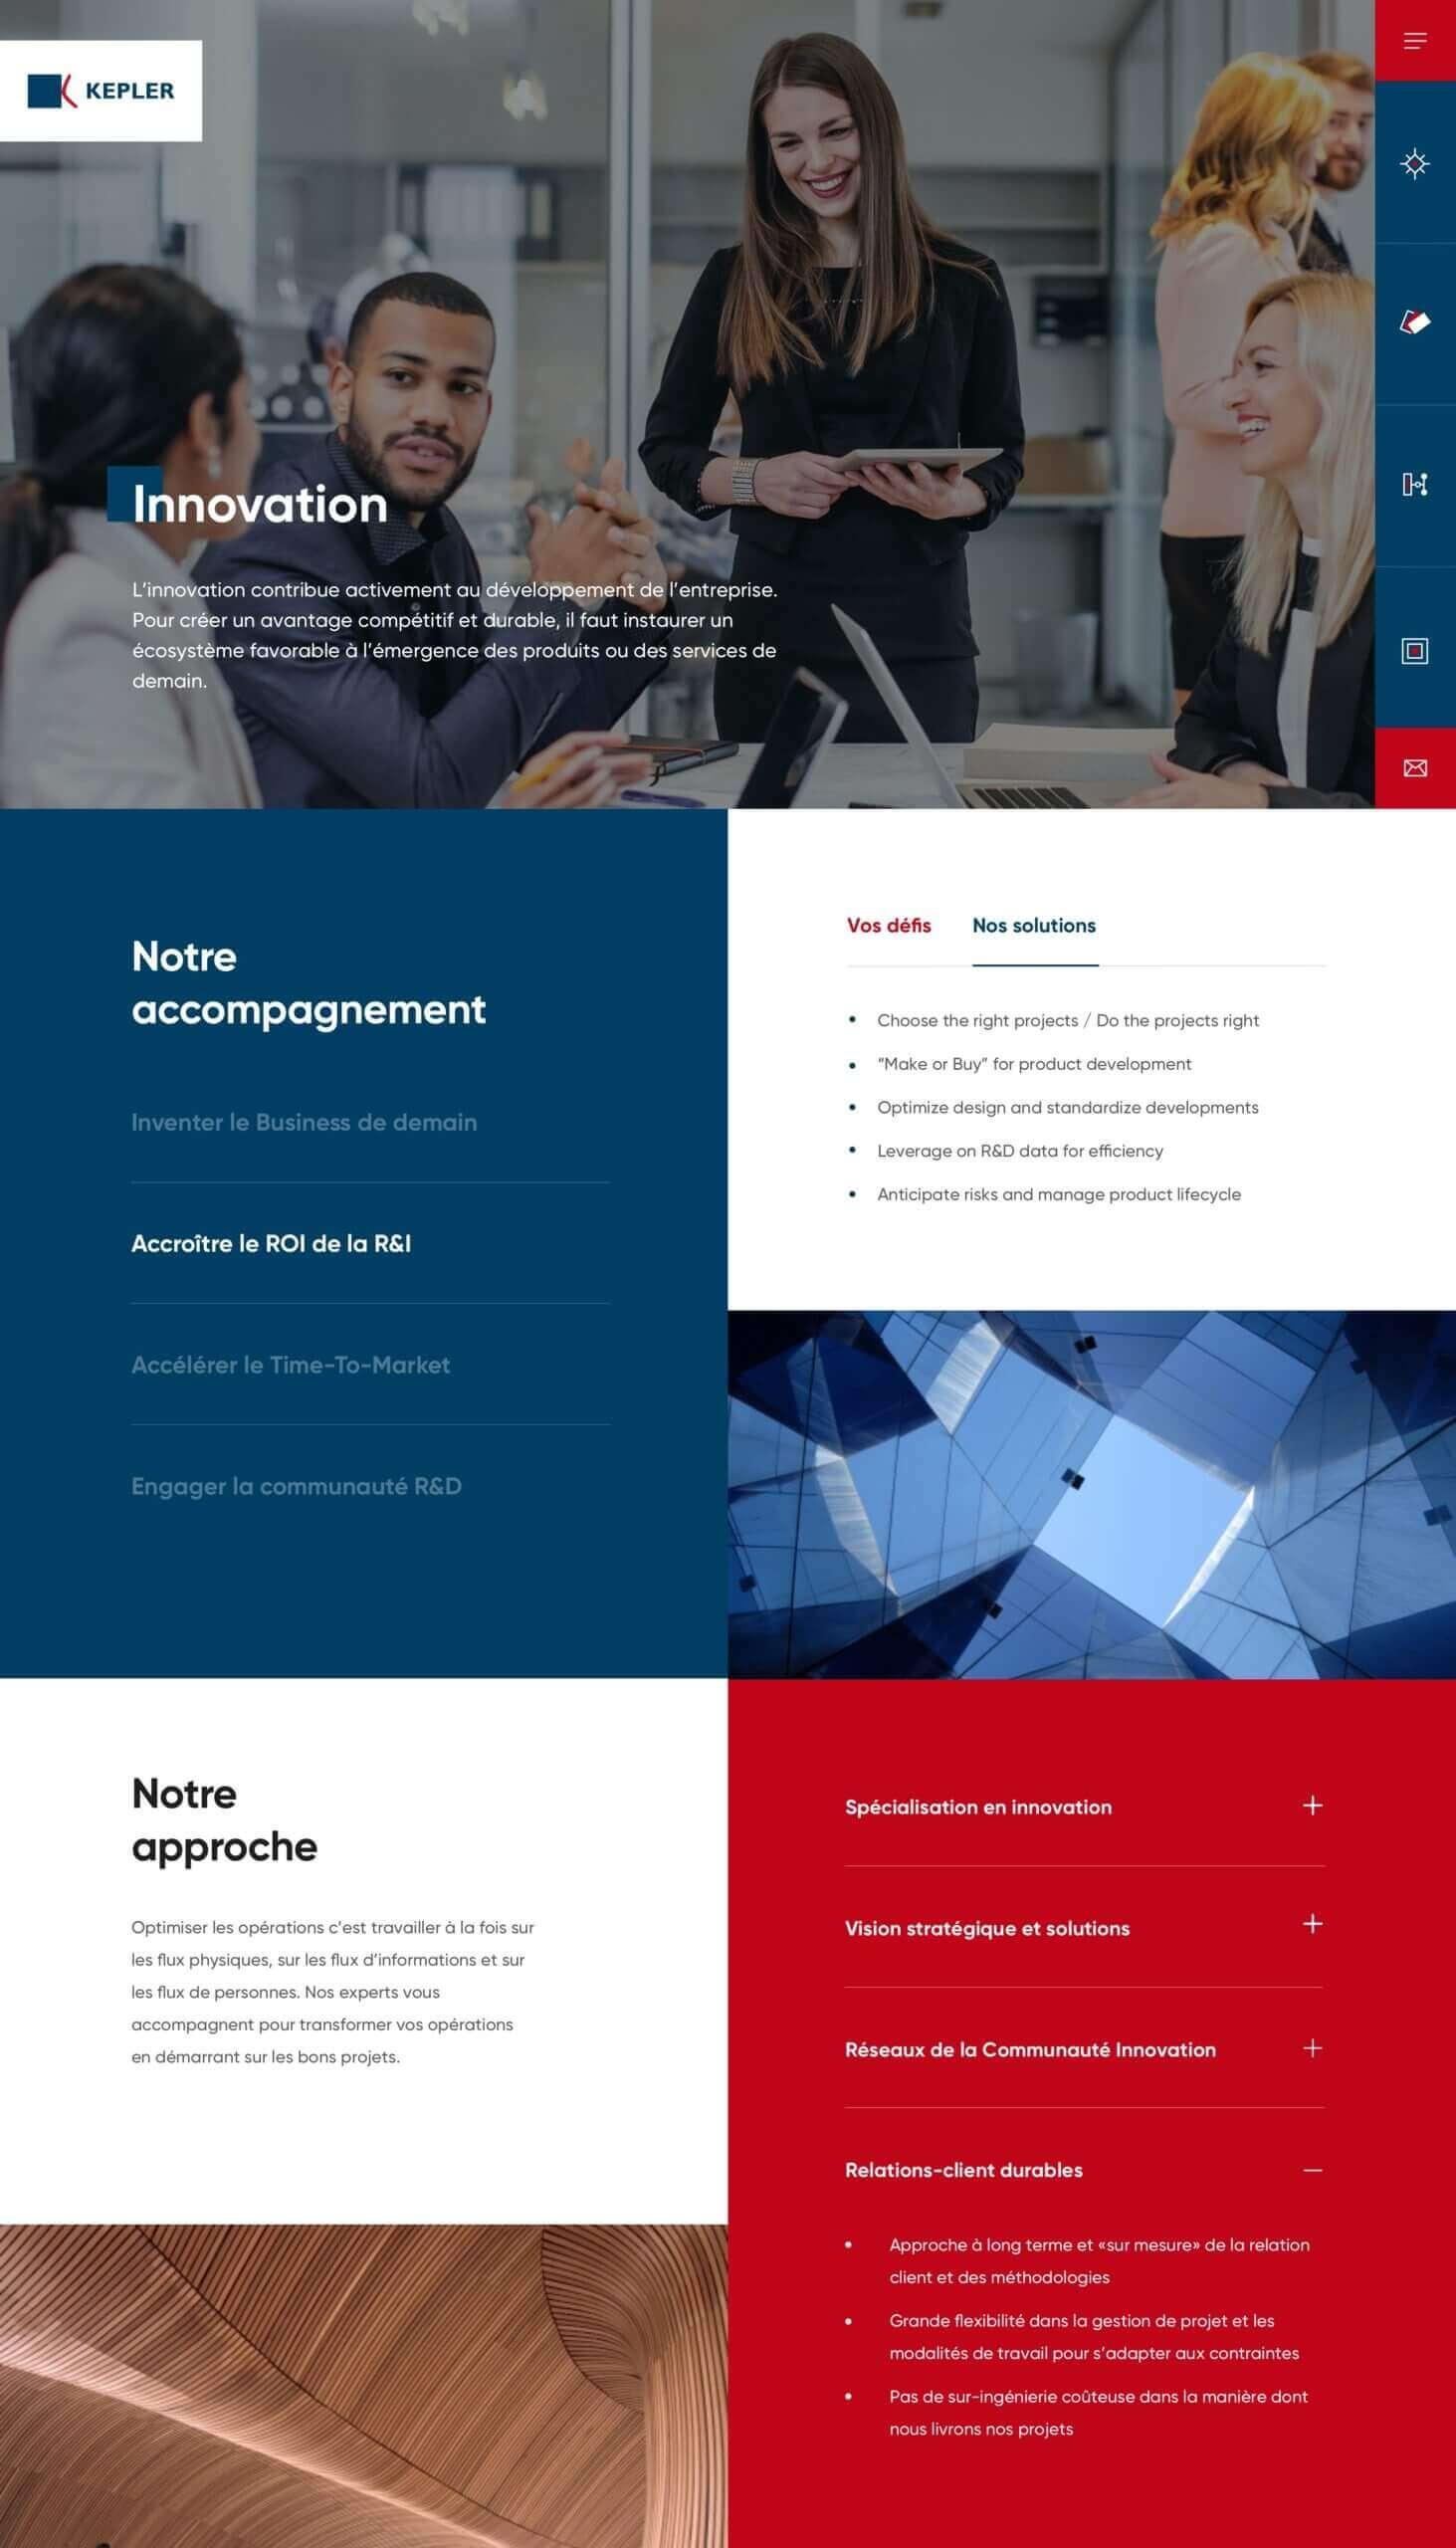 Design de la page inovation Kepler Consulting